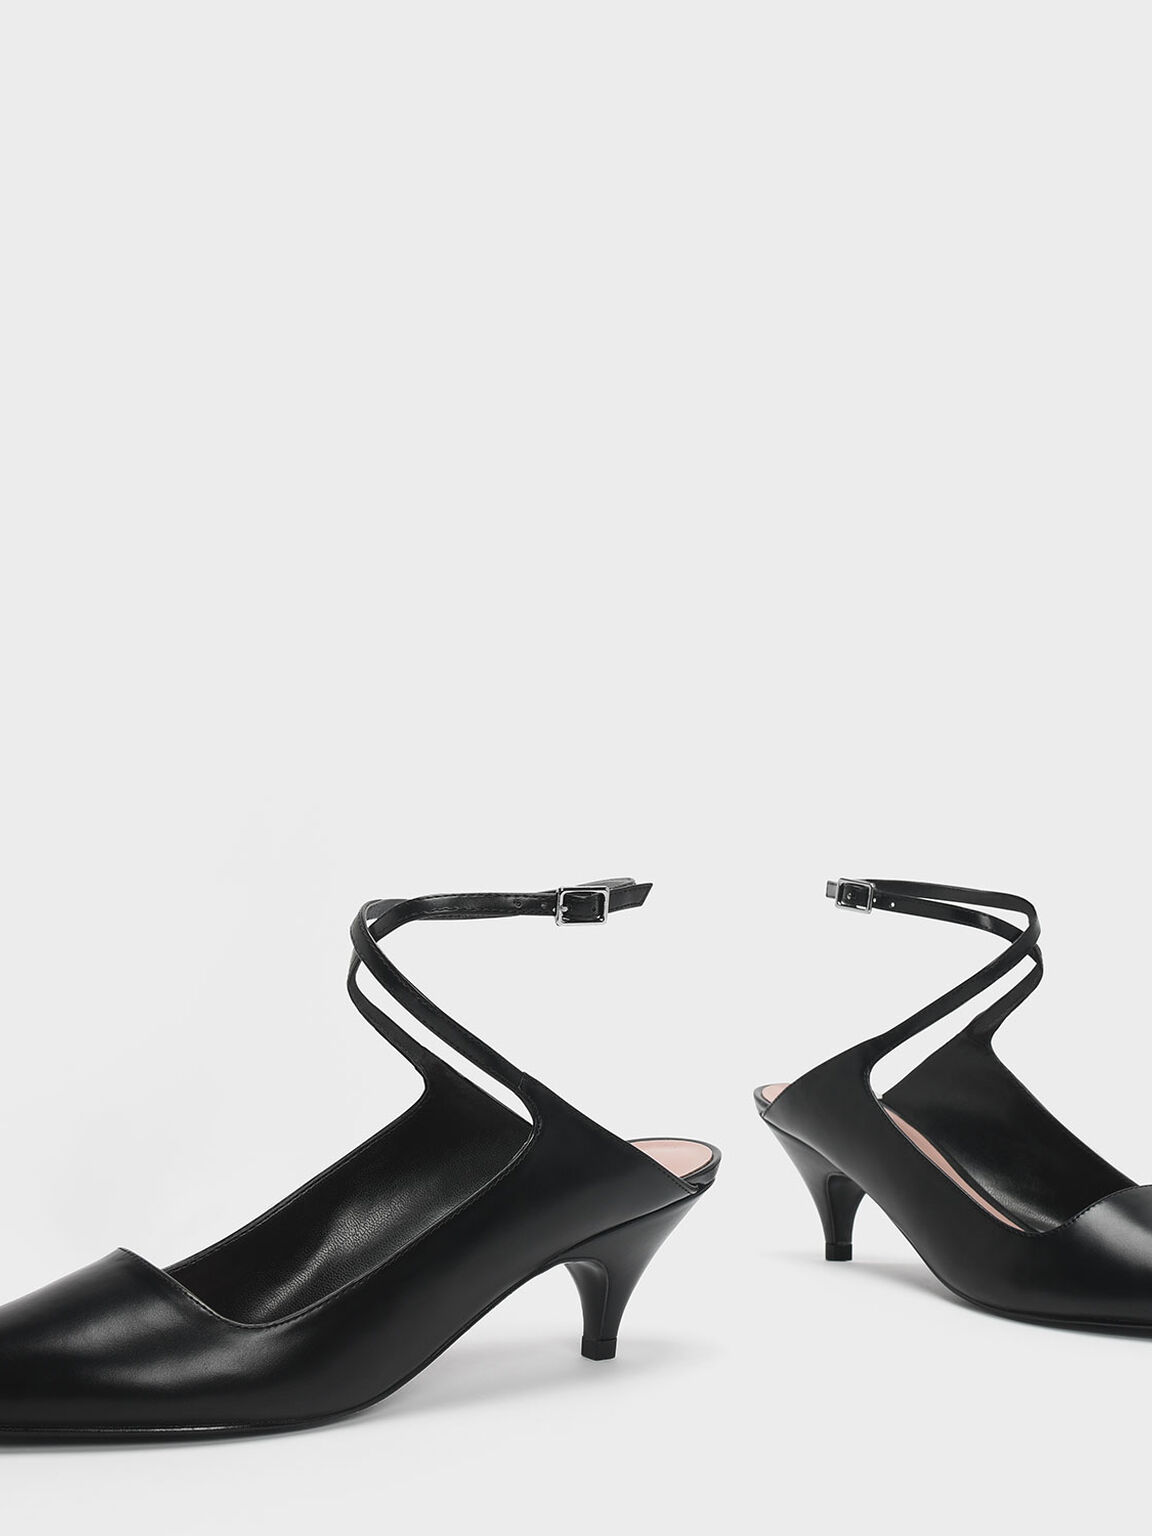 Criss Cross Ankle Strap Kitten Heel Pumps, Black, hi-res